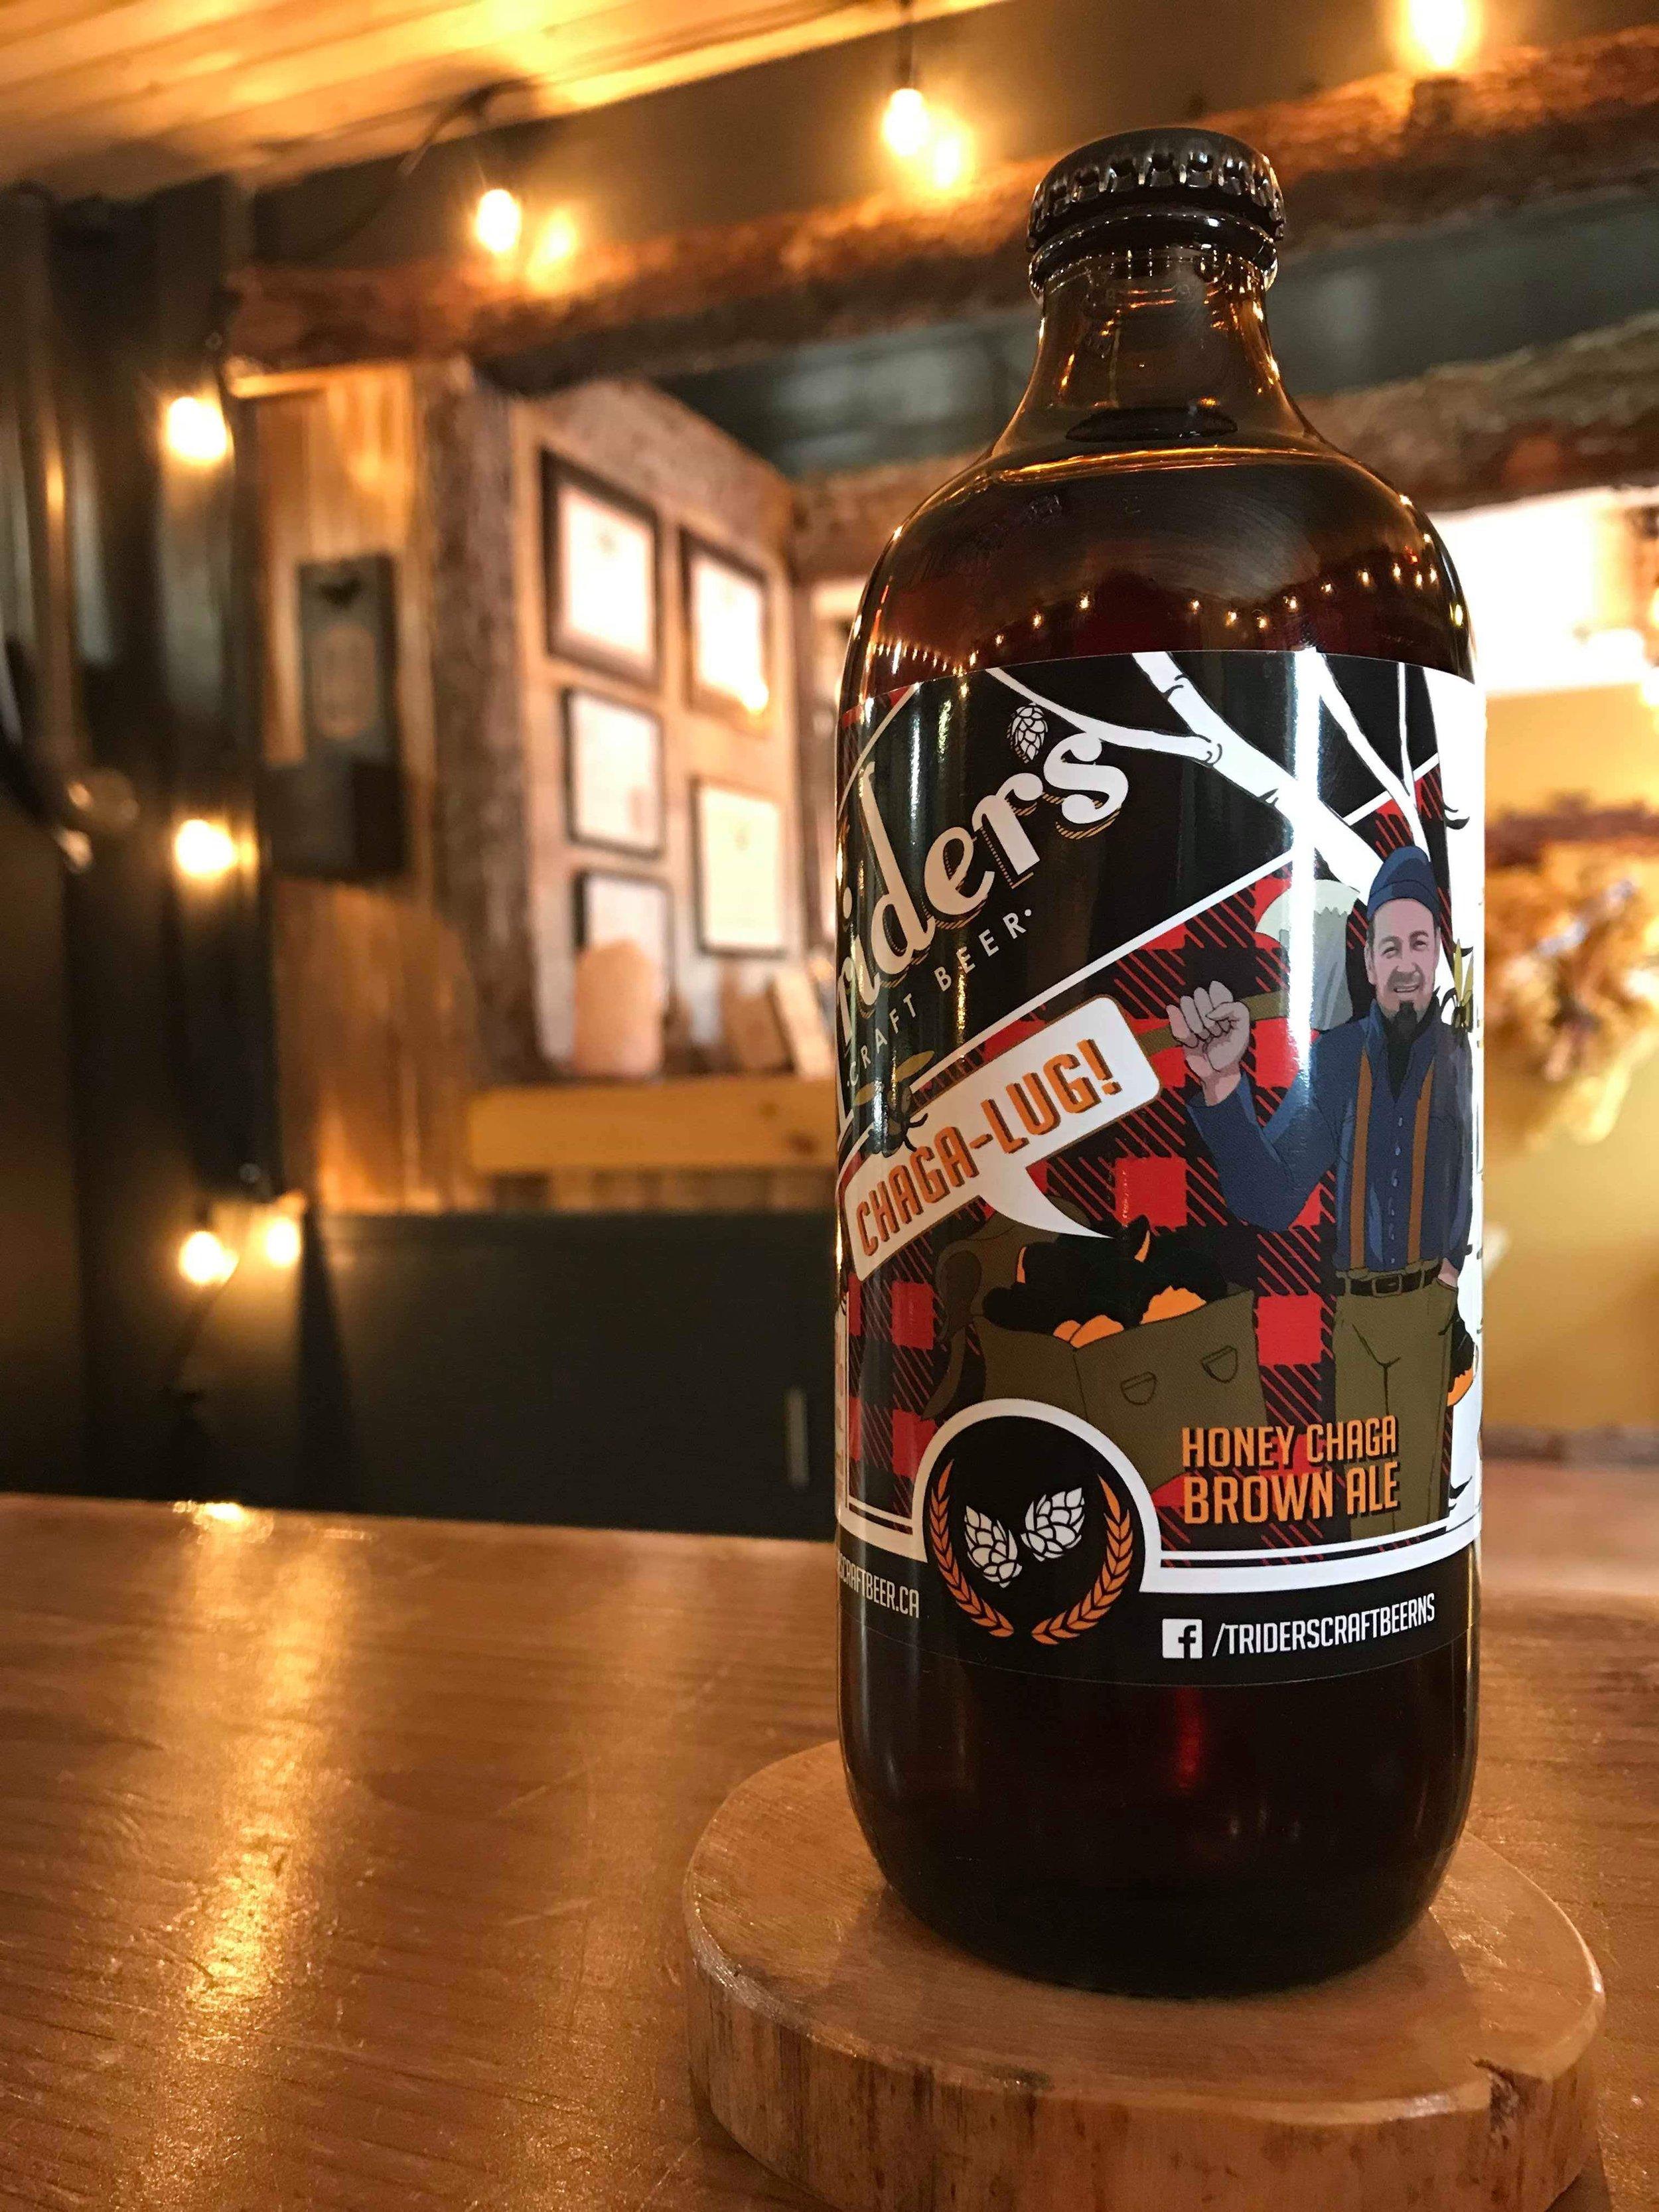 Chaga-Lug Honey Chaga Brown Ale